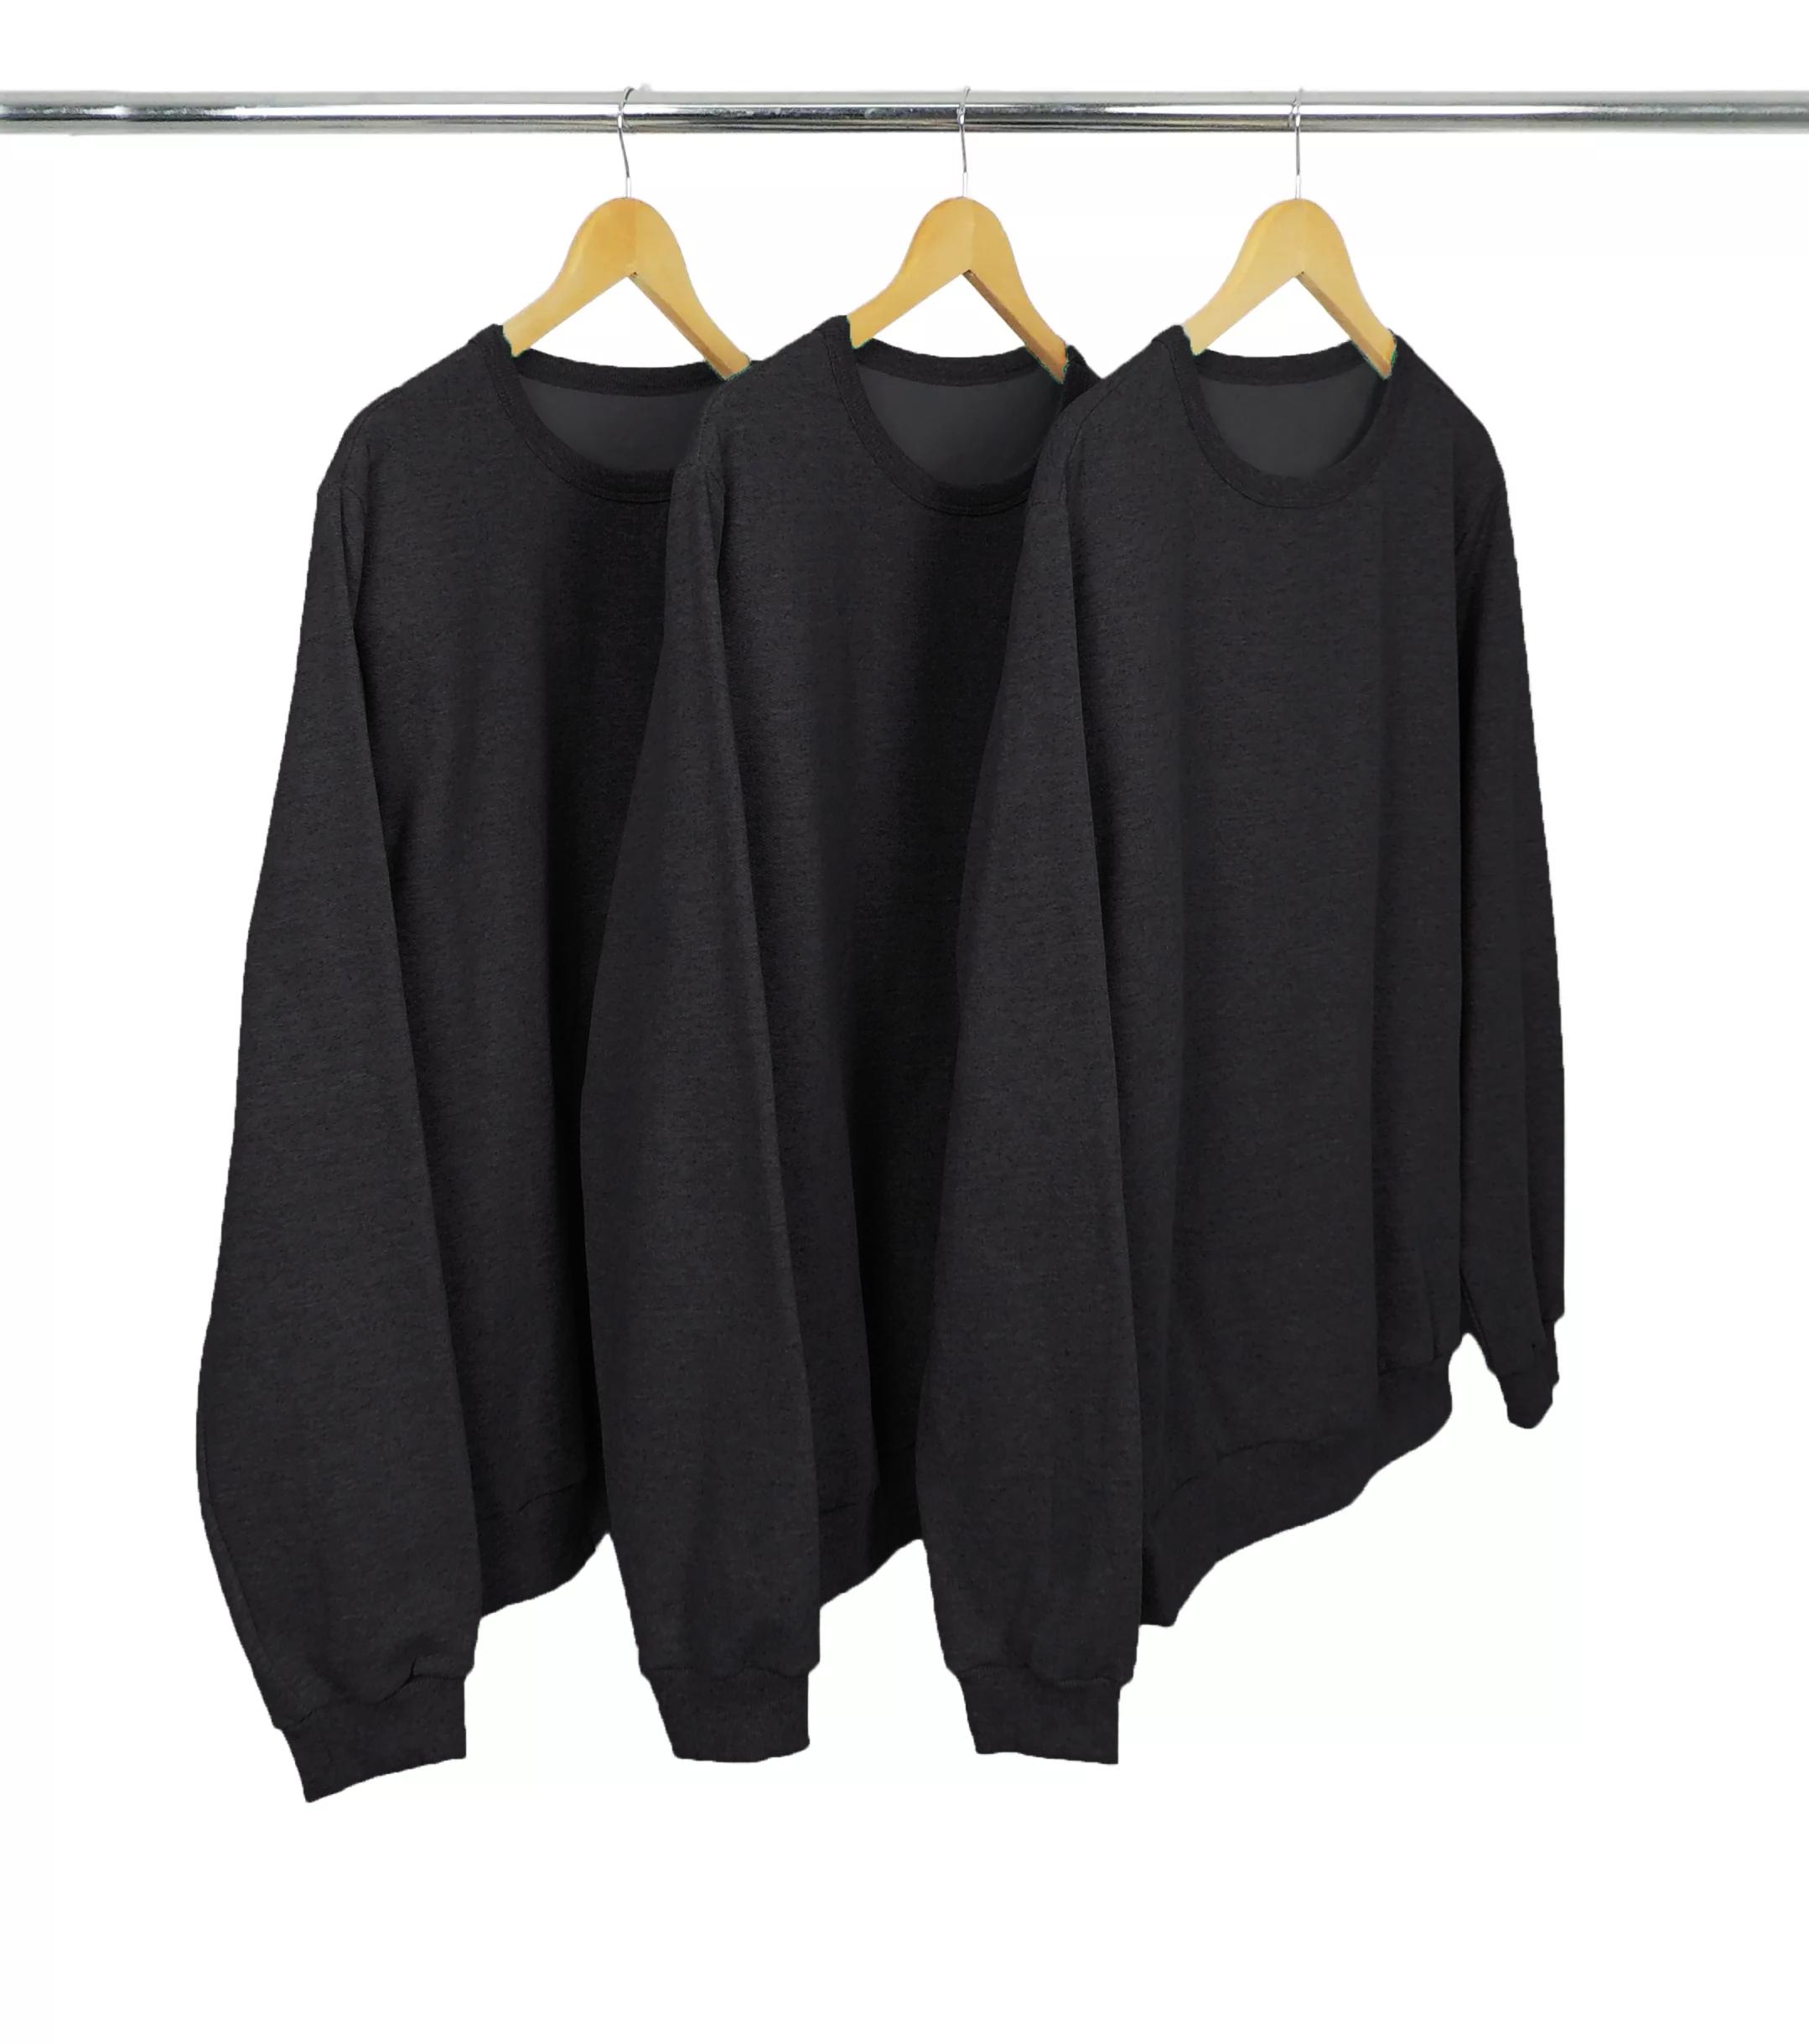 Kit 3 Blusões de Moletom Preto Mescla